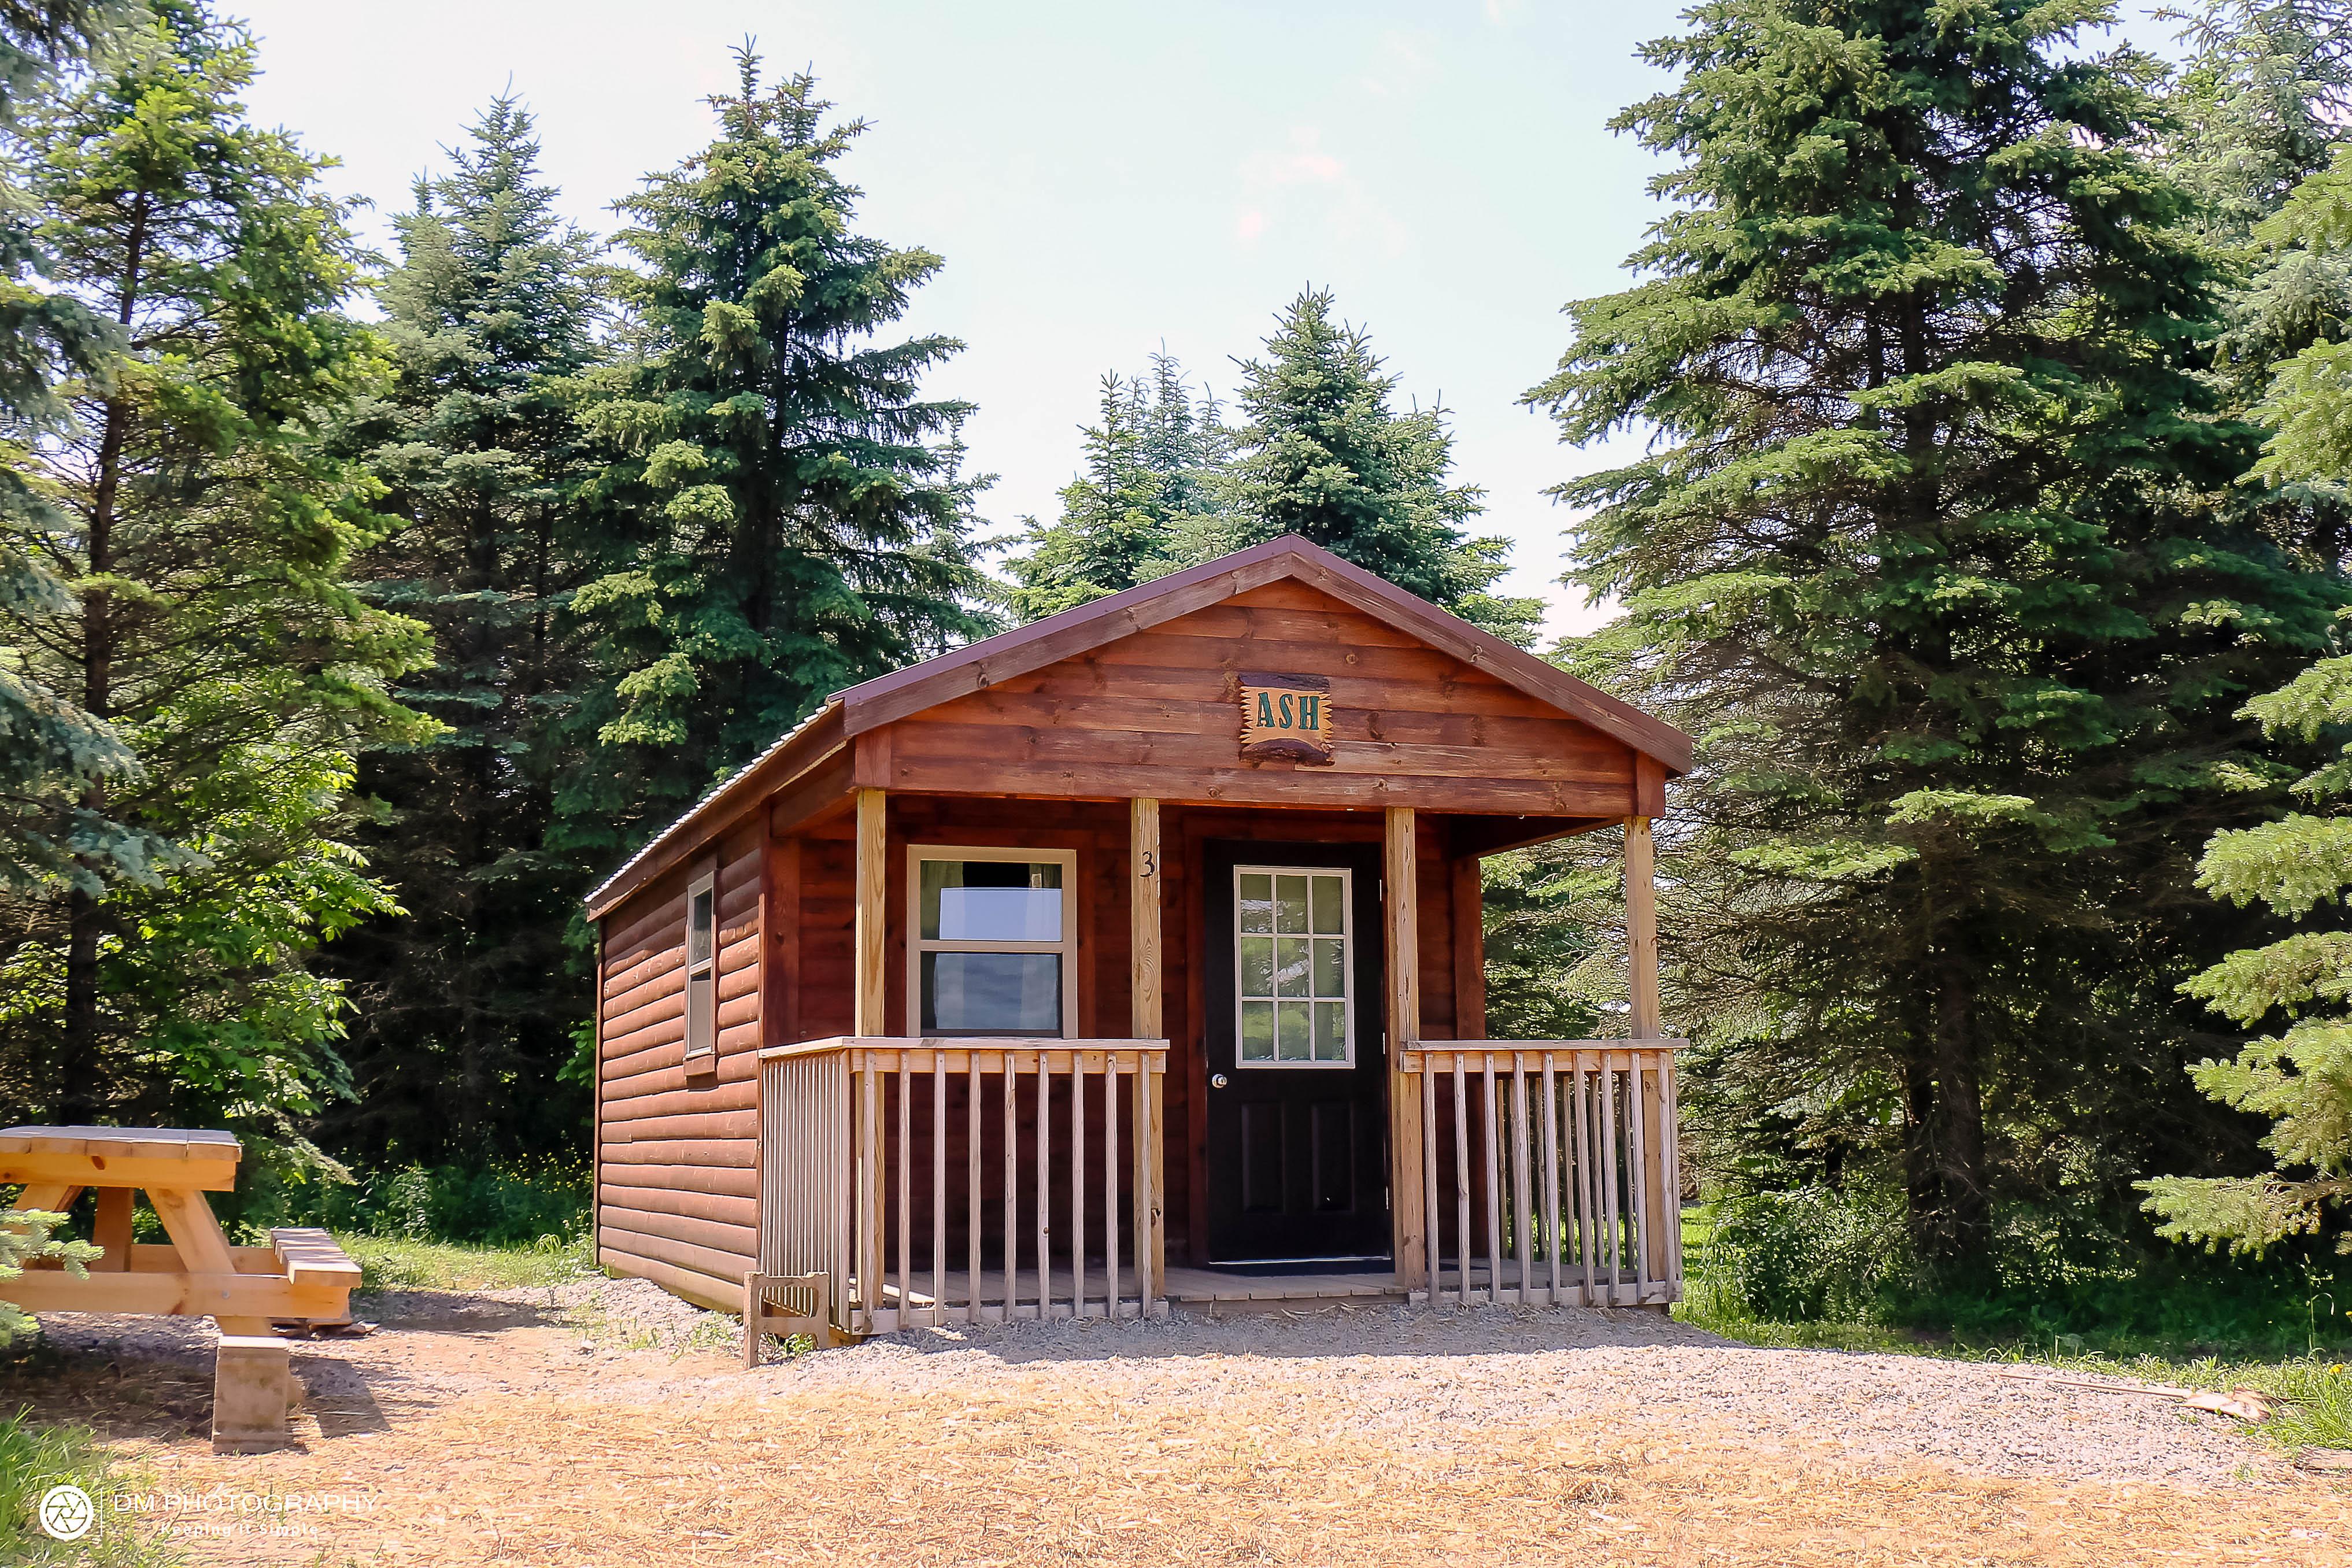 Ash Tall Pines Atv Park